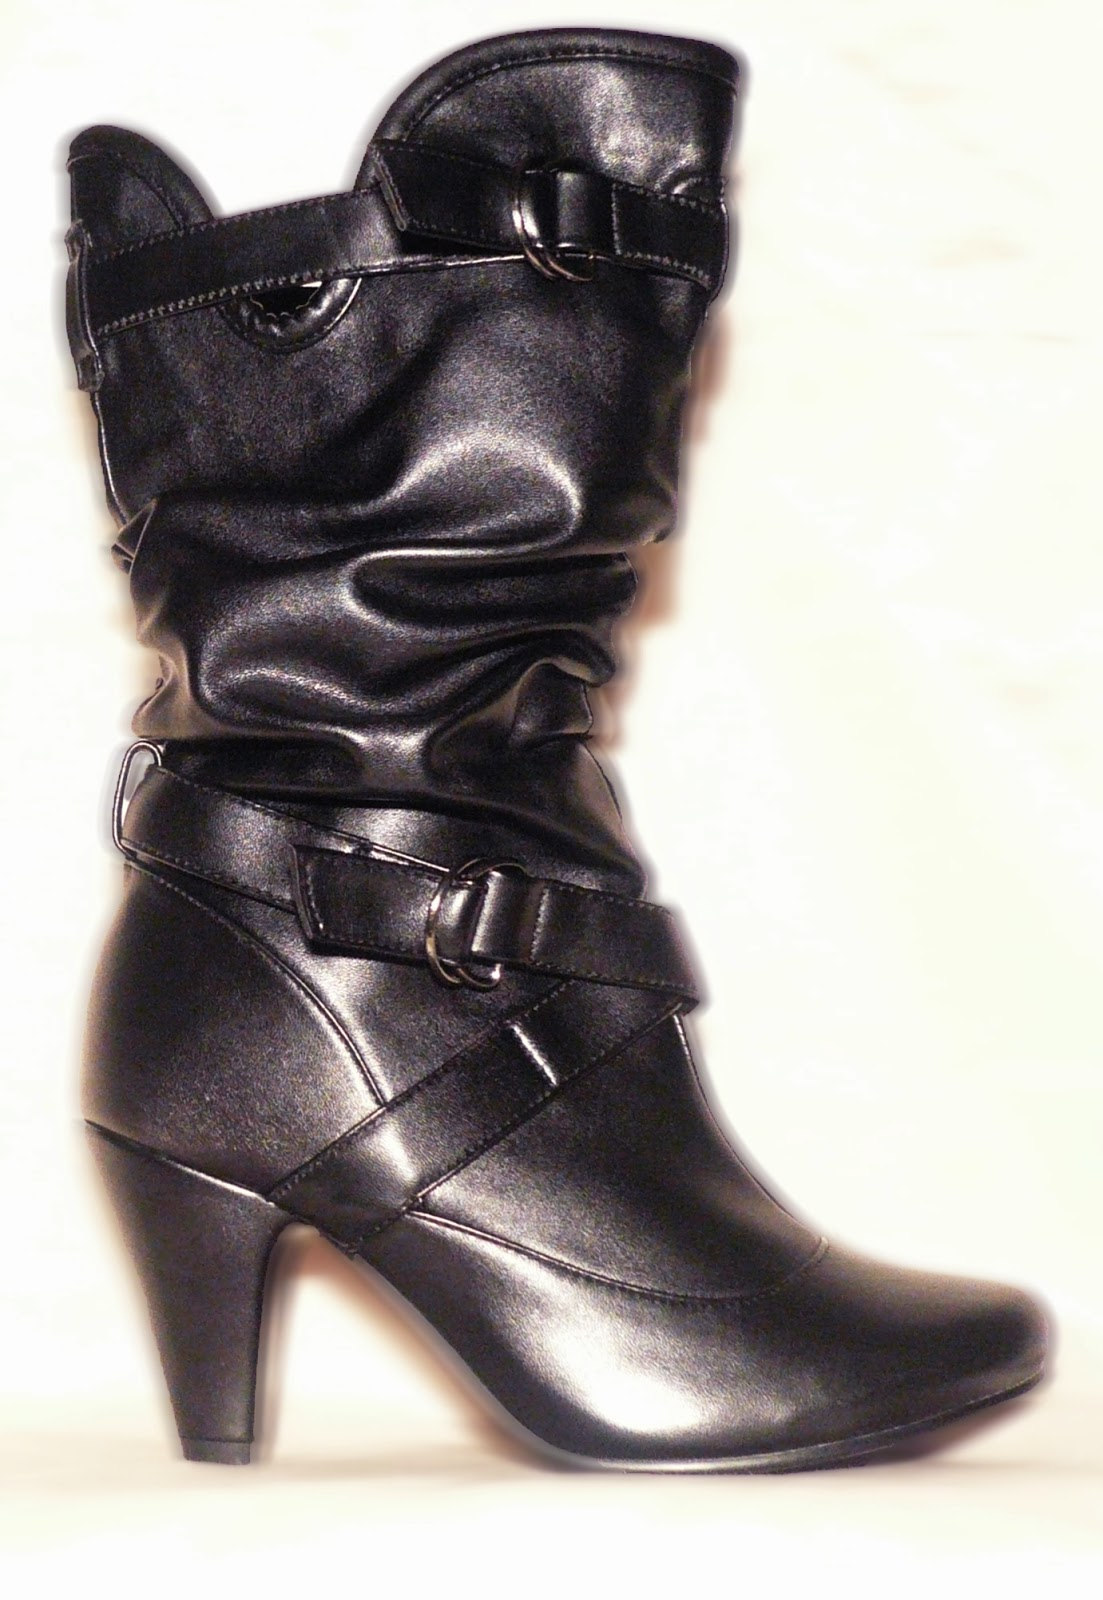 http://www.ebay.fr/itm/Bottes-bottines-chaudes-fourrees-37-40-41-dernieres-VITE-PETIT-PRIX-/300875879118?ssPageName=STRK:MESE:IT